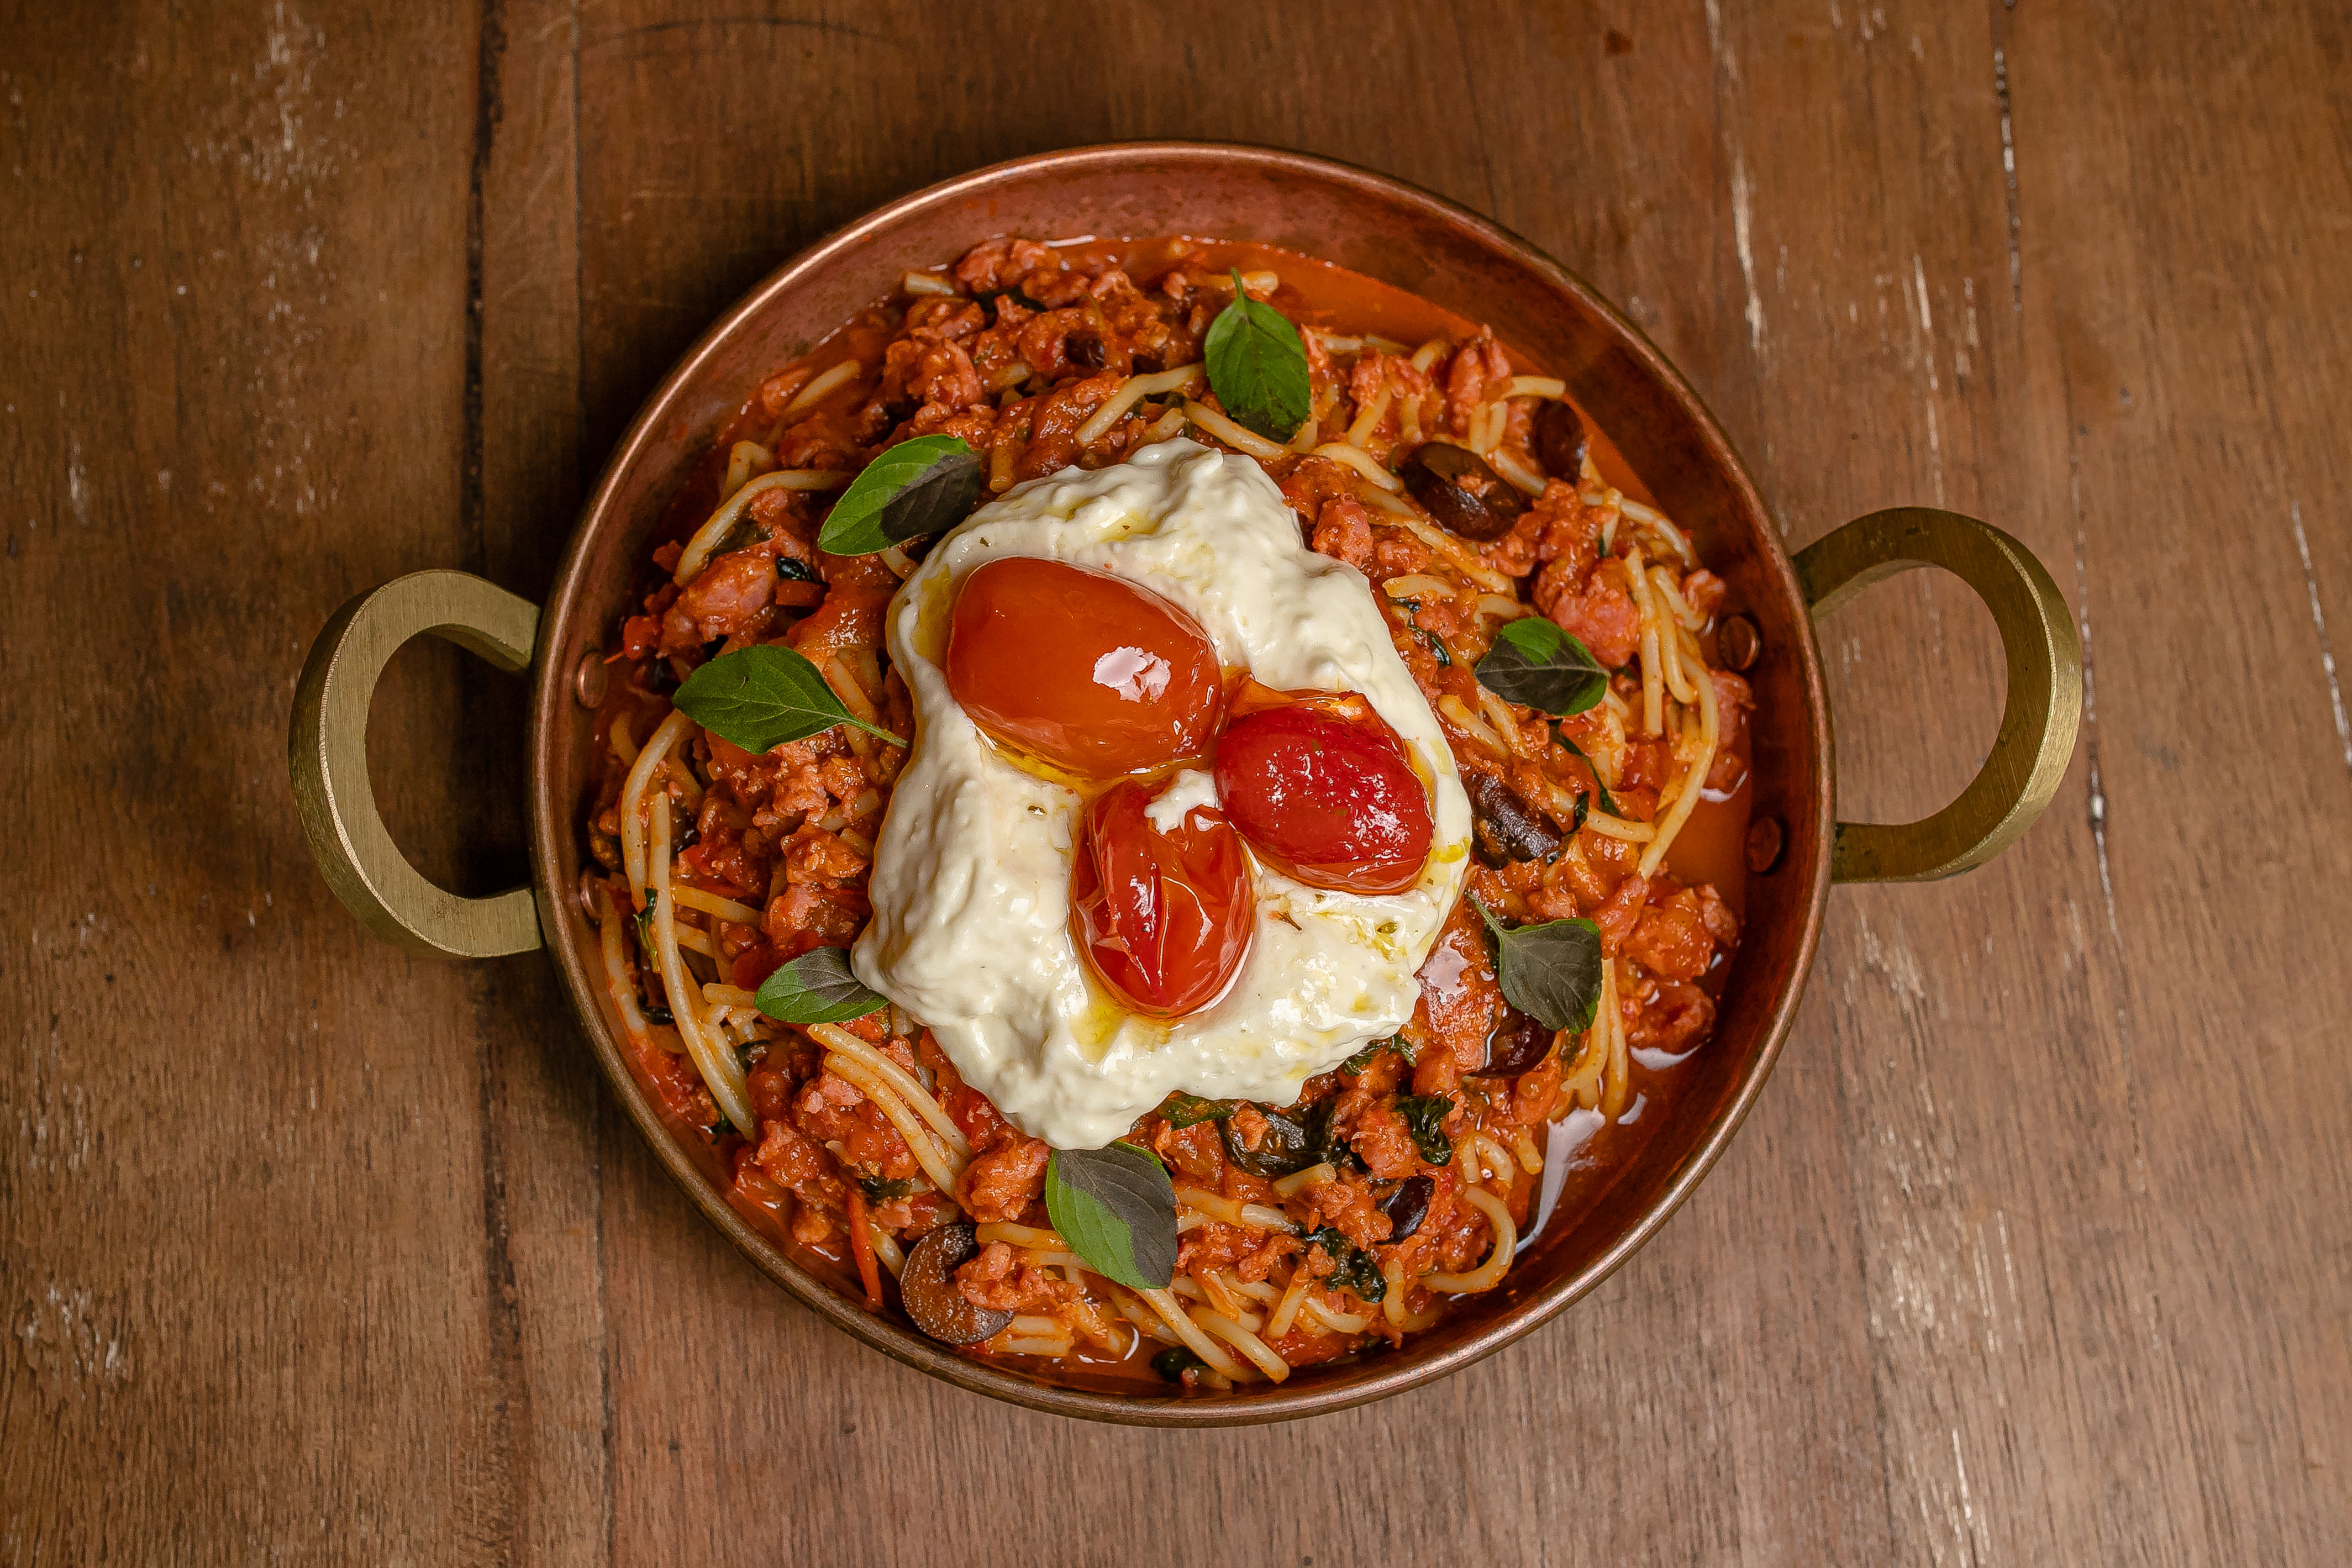 Spaghetti Toscana من مصنع النبيذ الإيطالي Gioconda، em Santa Teresa